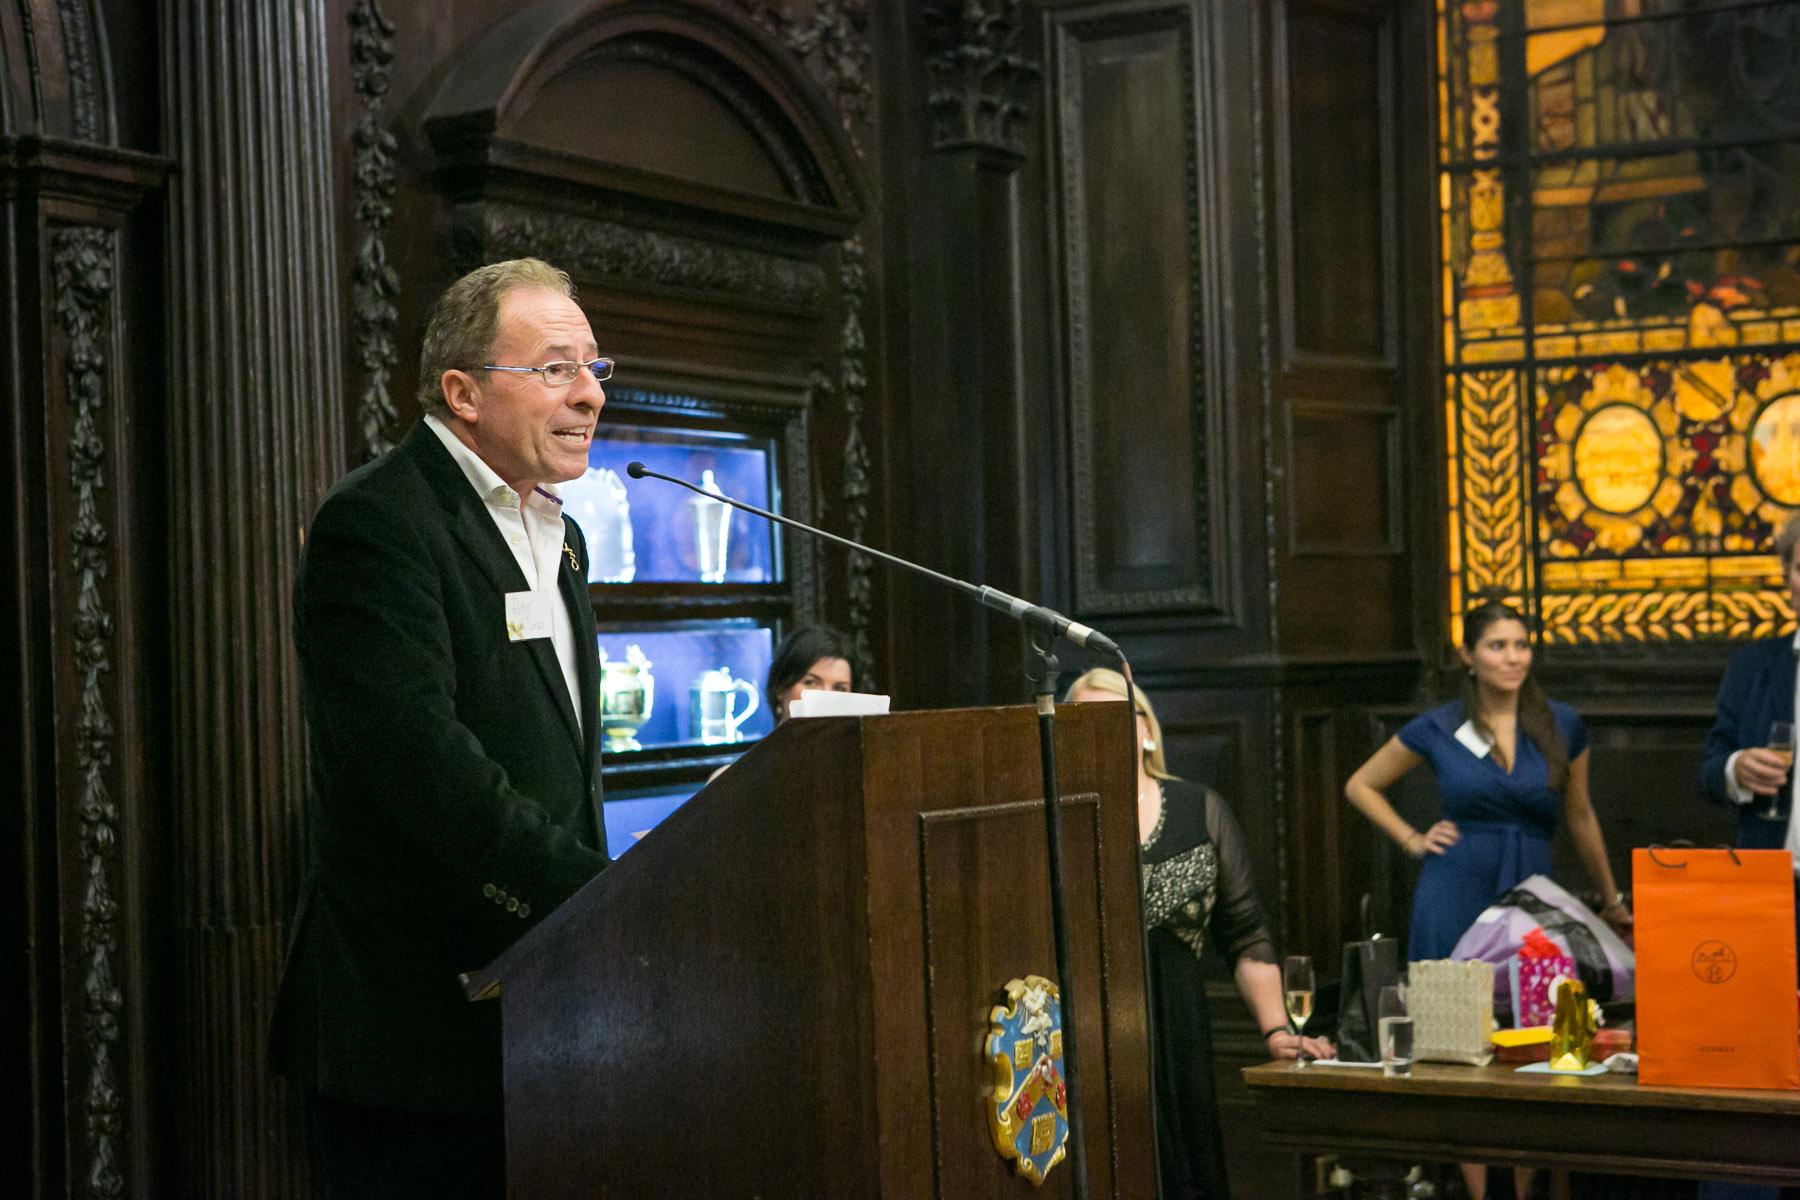 Peter James speaking